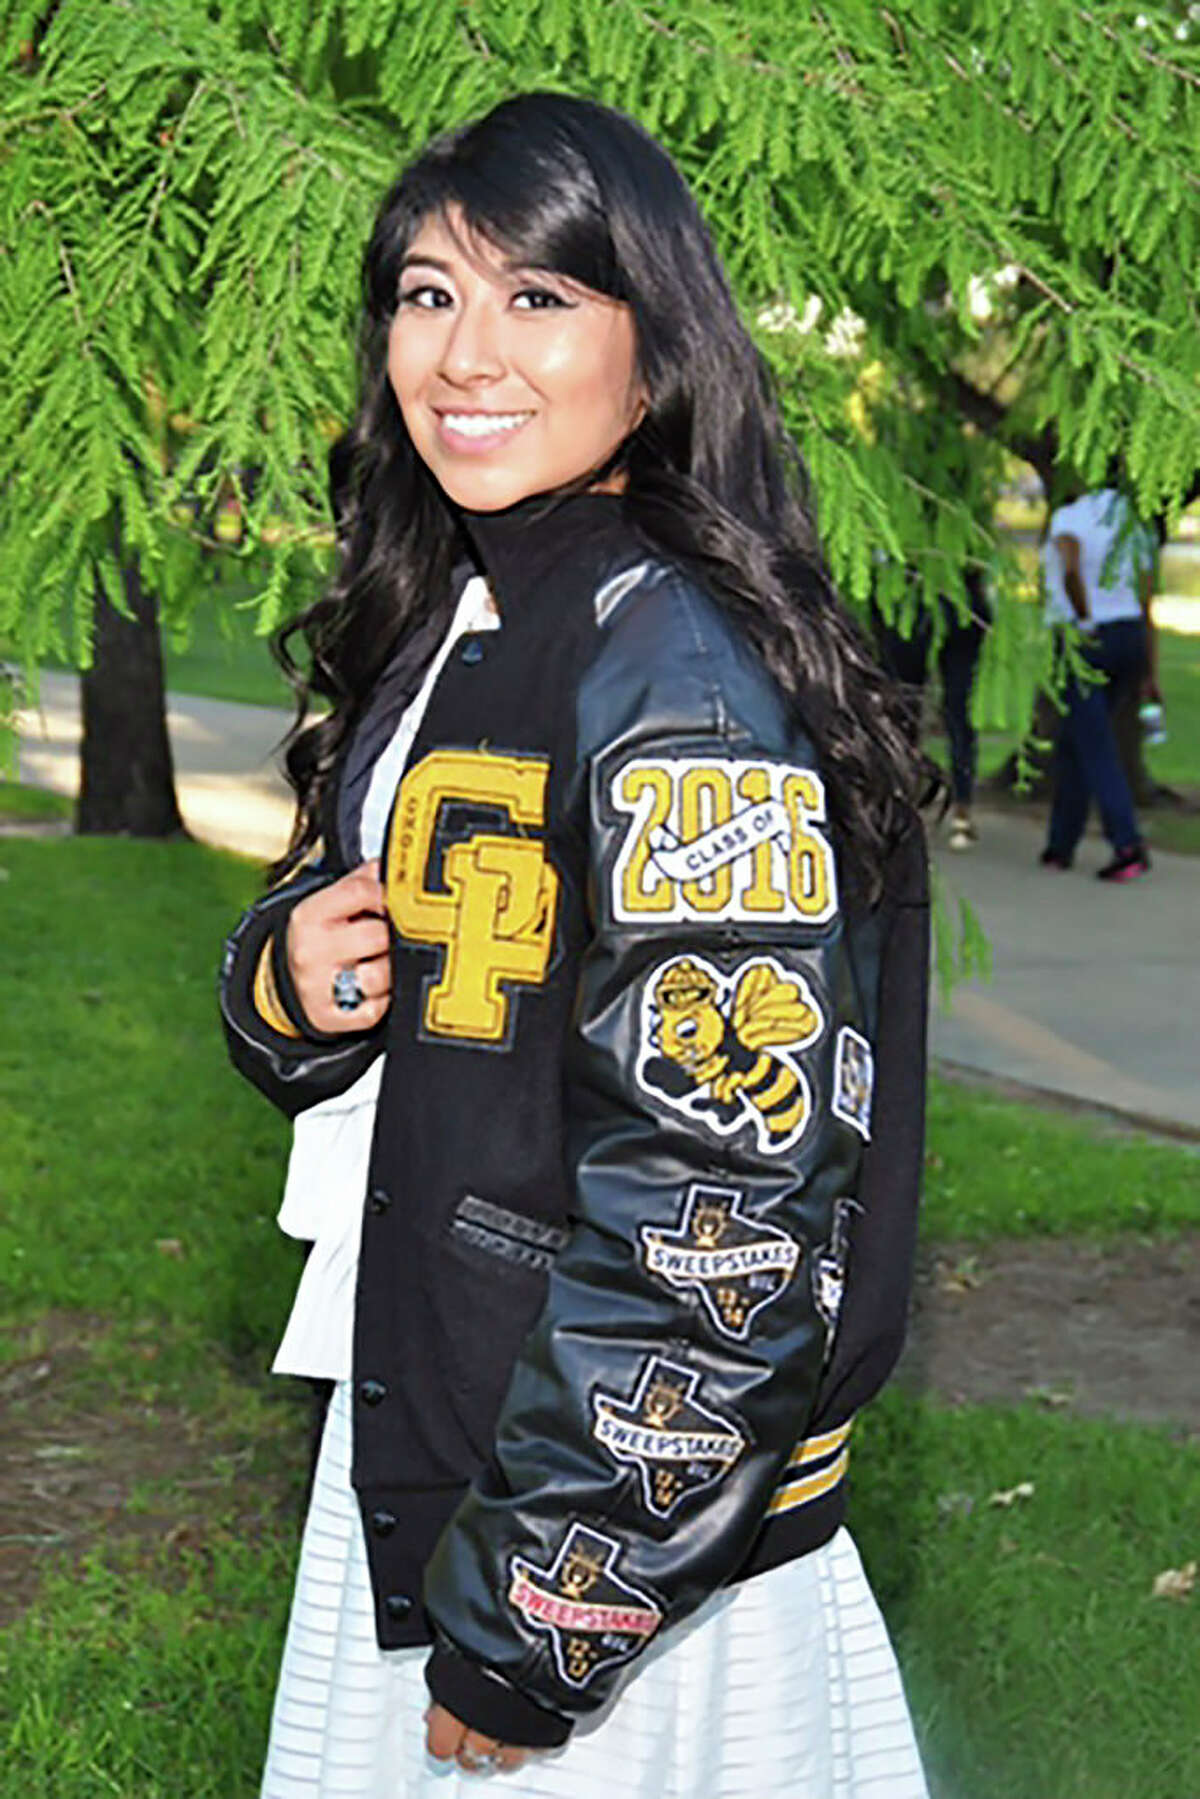 San Jacinto College Upward Bound Math & Science Academy student Jocelyn Yanez has earned a Gates Millennium Scholarship from the Bill & Linda Gates Foundation.